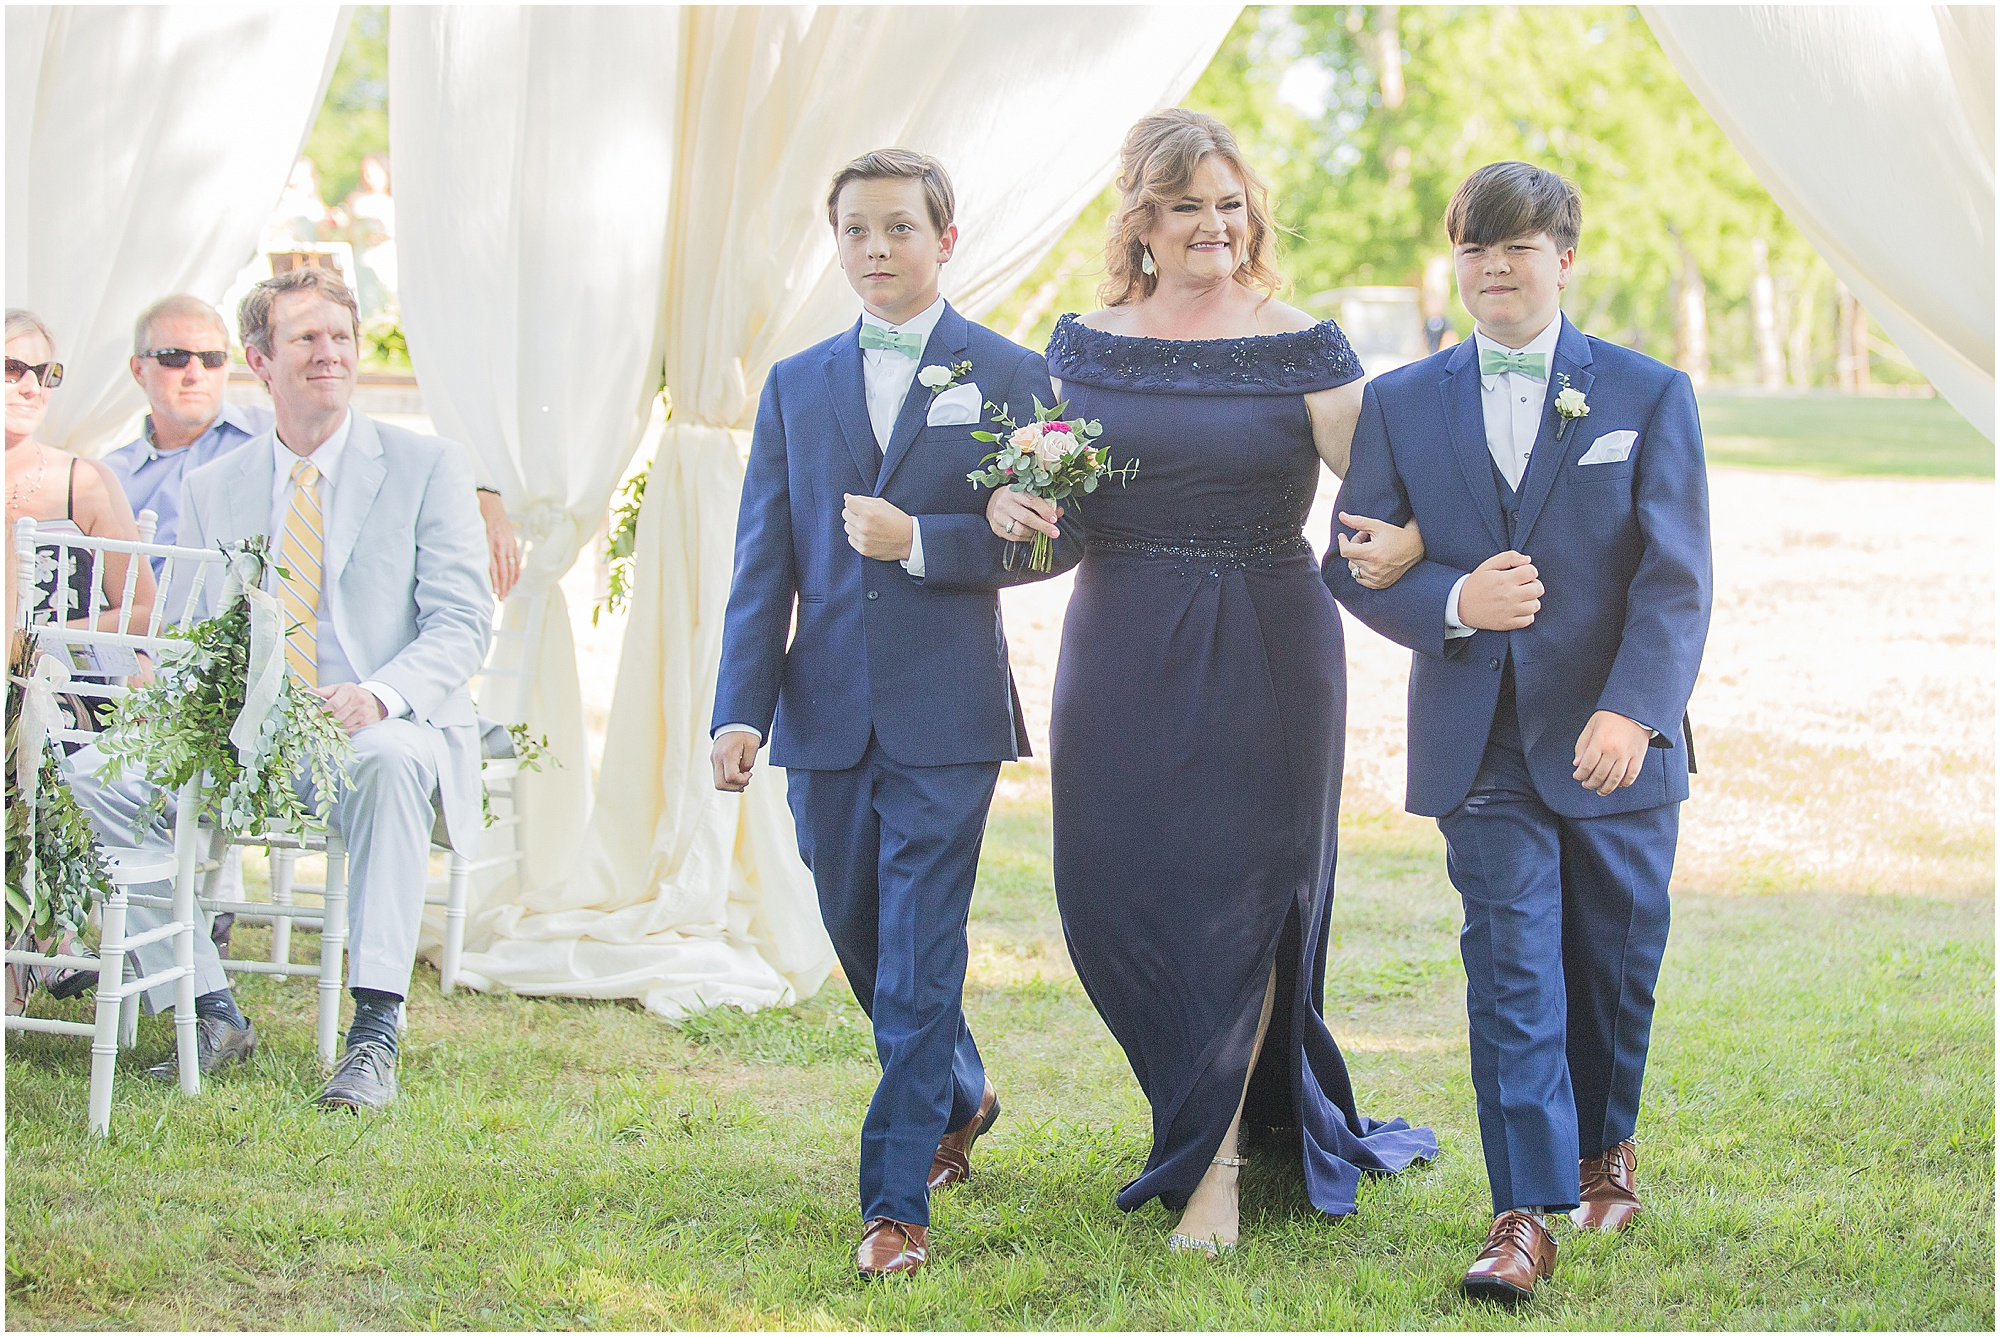 starkville-mississippi-wedding-page-place-dodson-farms_0054.jpg